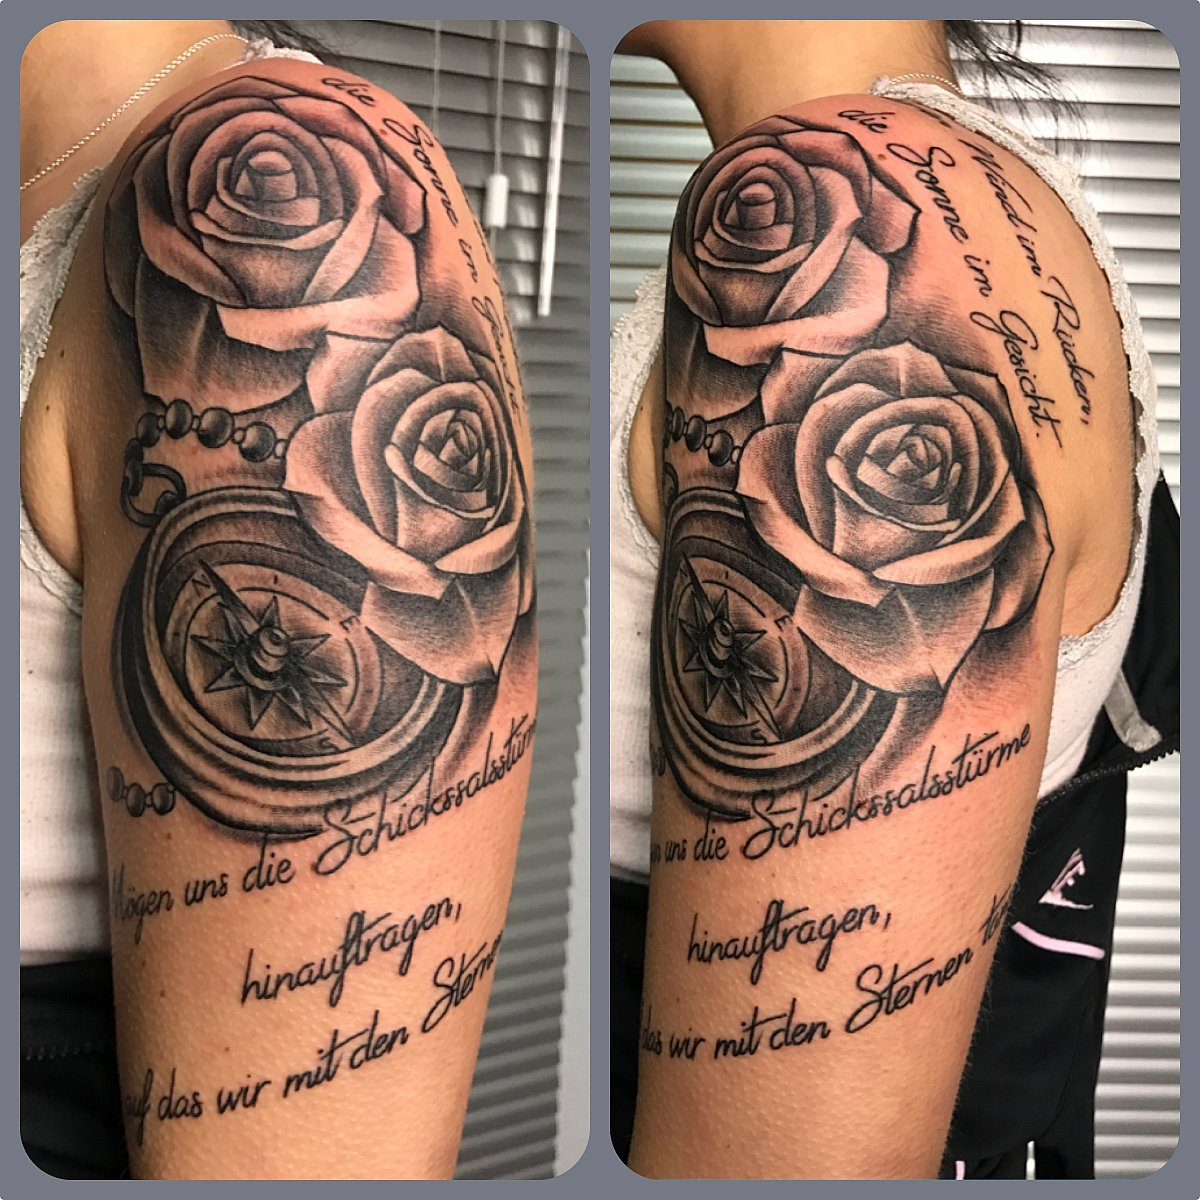 Tattoo studio speyer